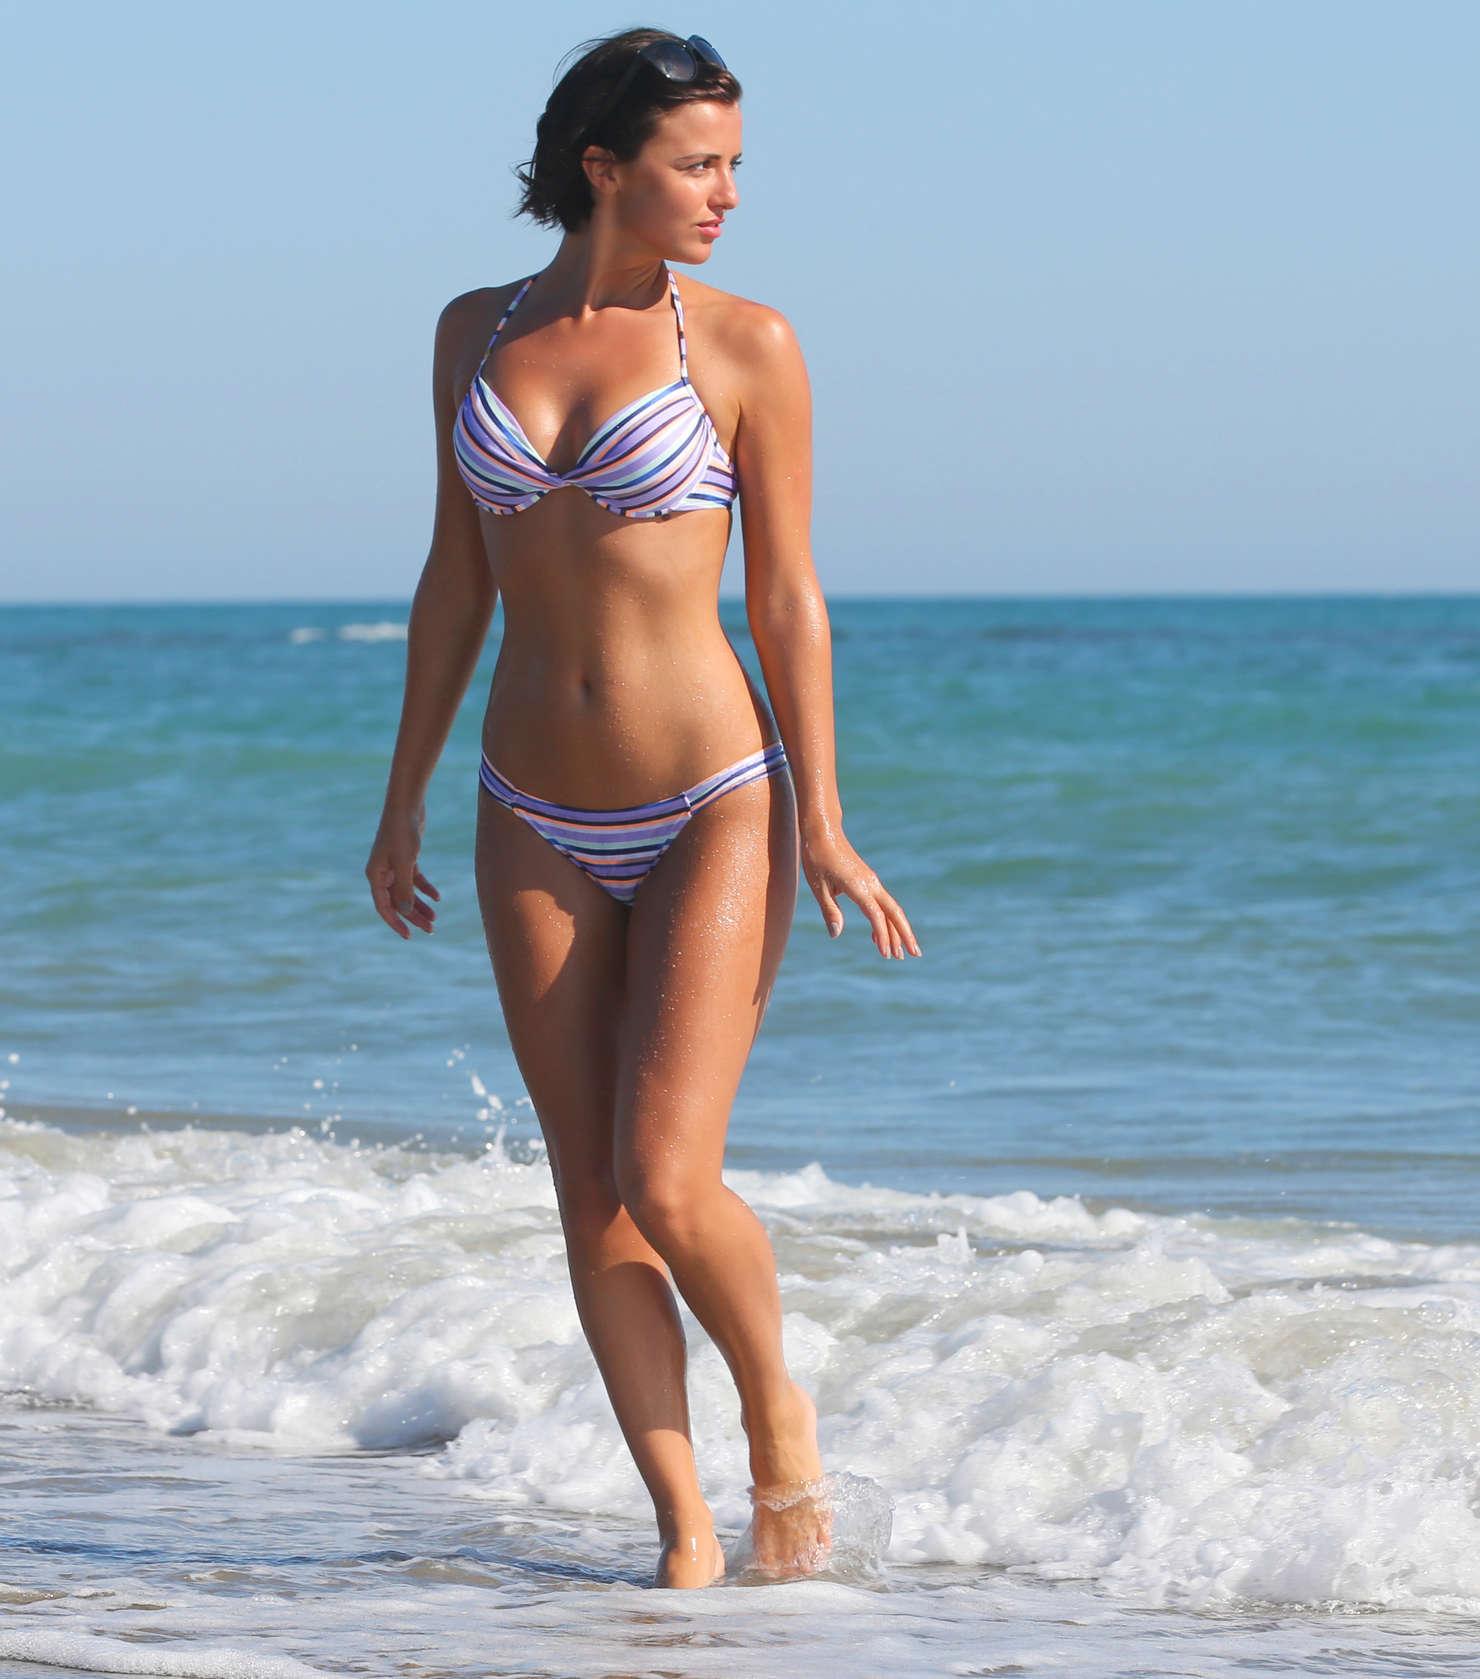 Lucy Mecklenburgh 2014 : Lucy Mecklenburgh in bikini -31